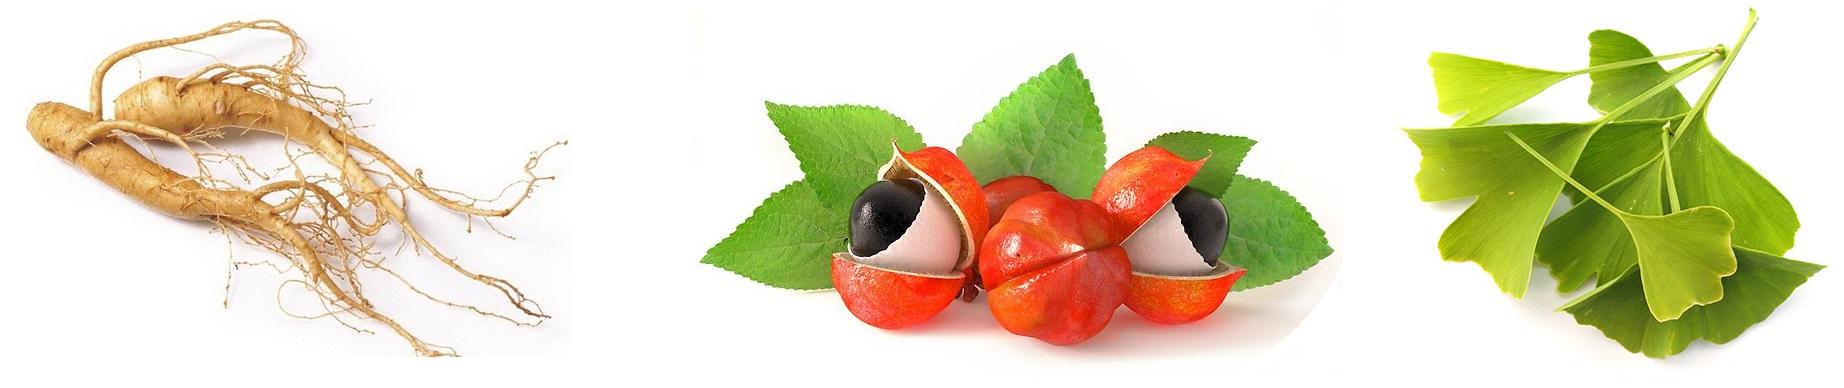 ginseng guarana ginkgo capsules vitaminbottle